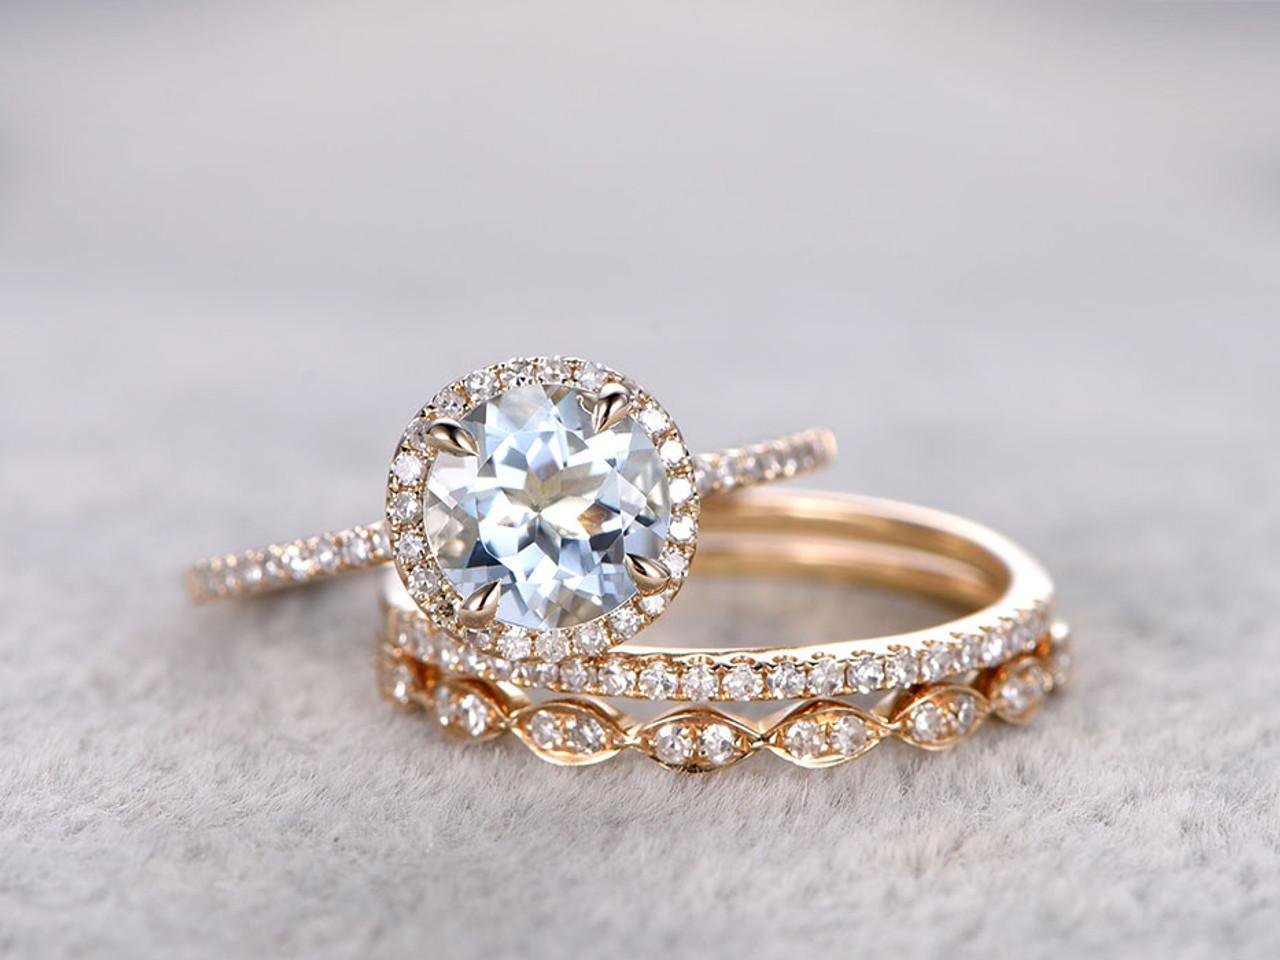 3pcs Aquamarine Bridal Ring Set Diamond Wedding Band Yellow Gold Art Deco Thin Stacking Matching 14k 18k